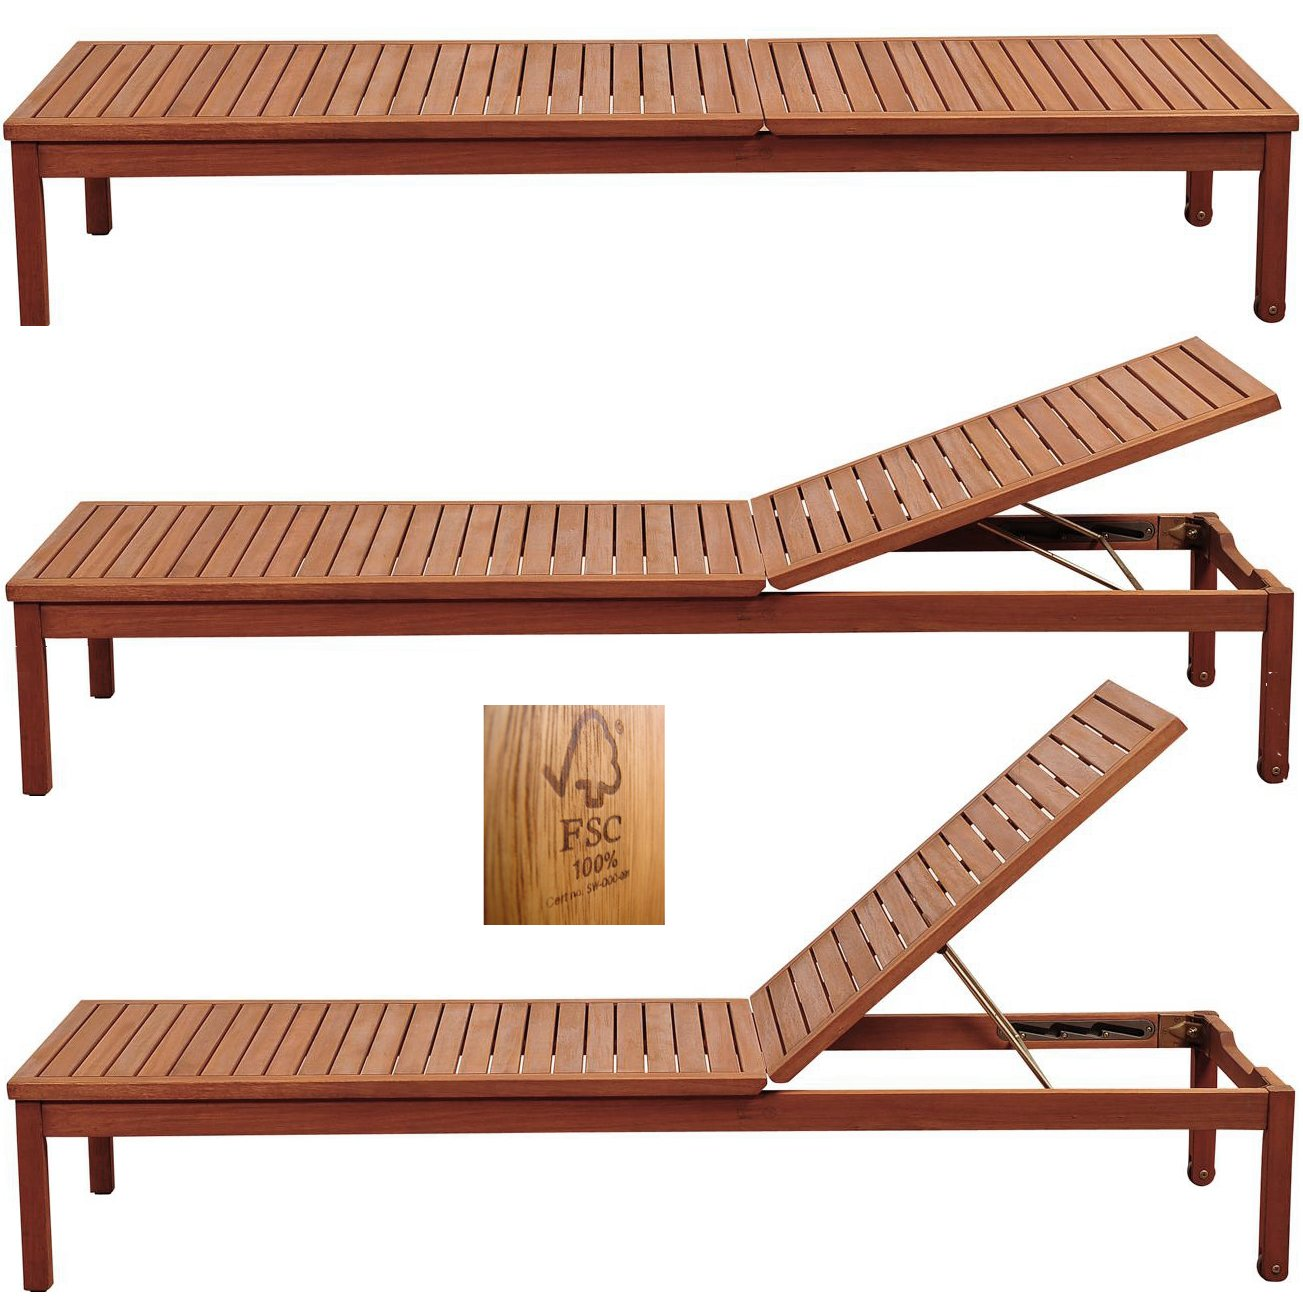 Amazon.de: Holzliege Gartenliege Sonnenliege Relaxliege Liegestuhl ...